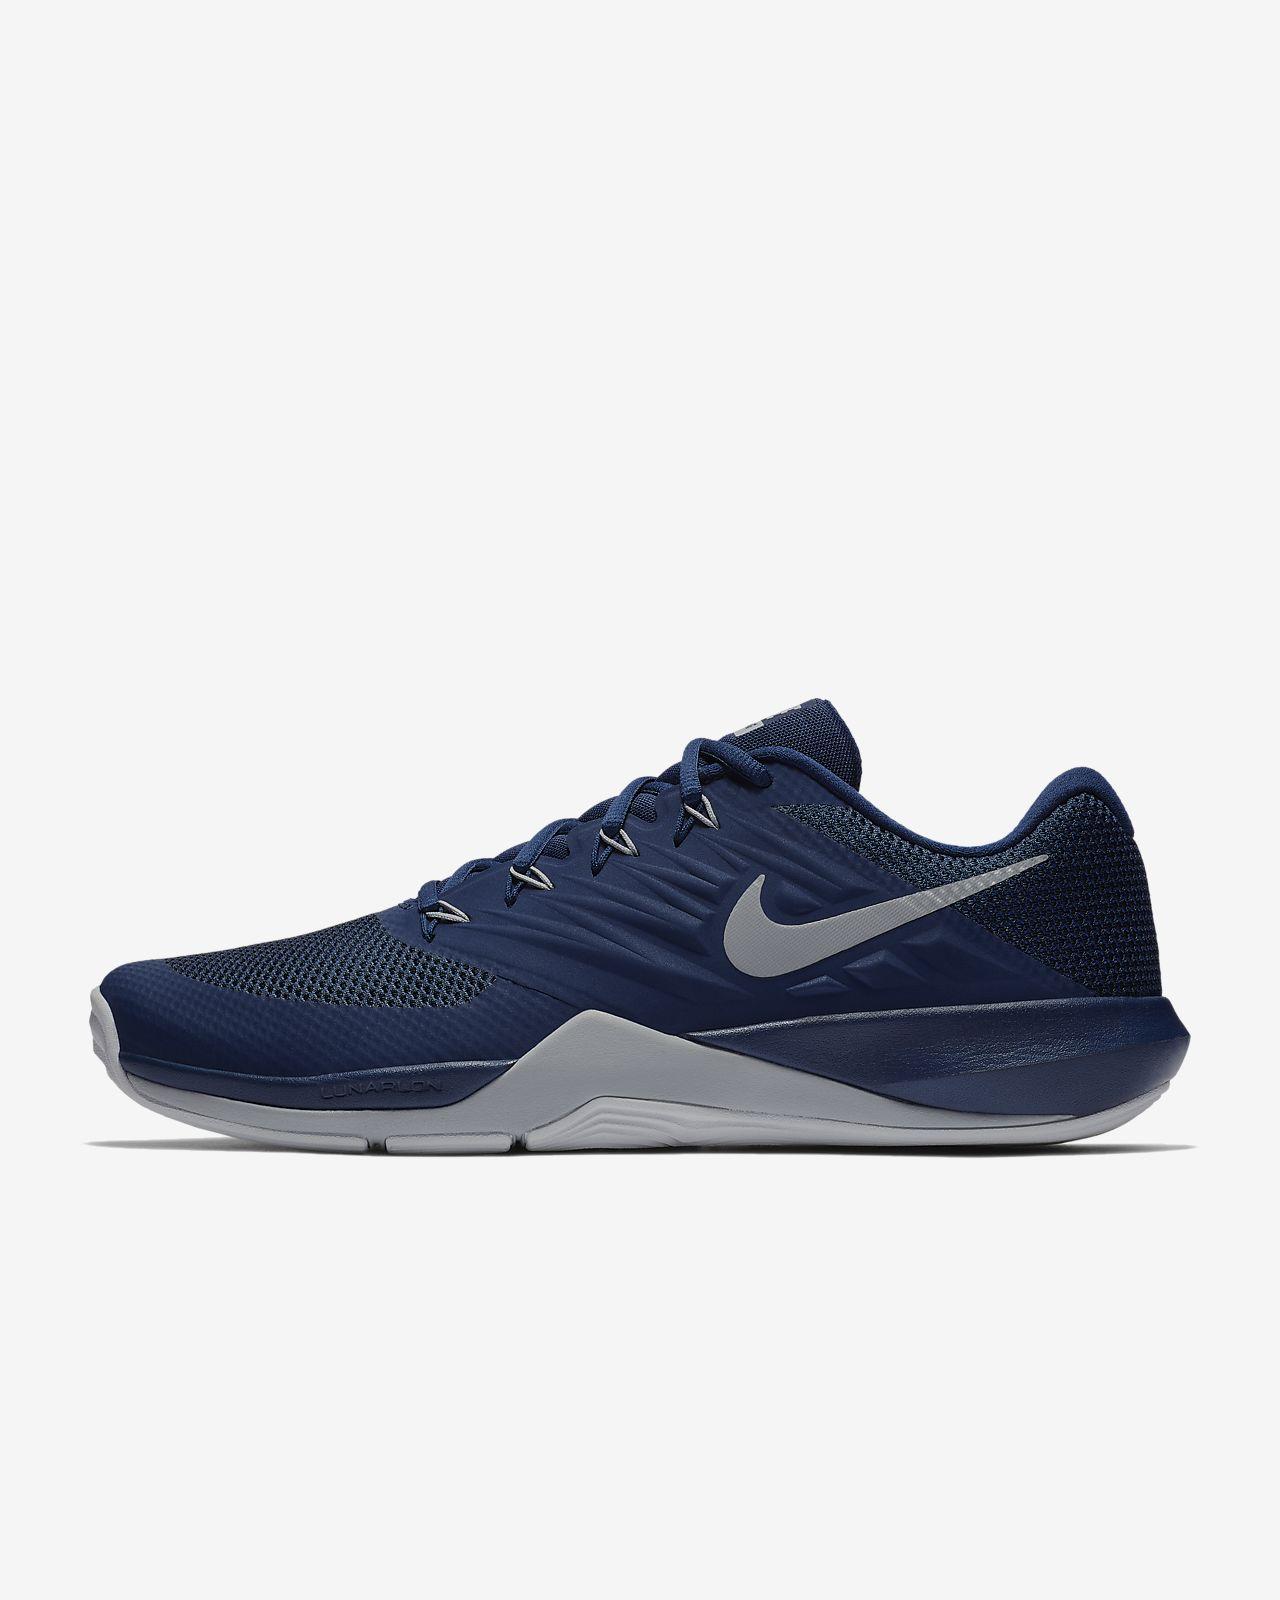 Mens Lunar Prime Iron Ii Fitness Shoes Nike loV6j